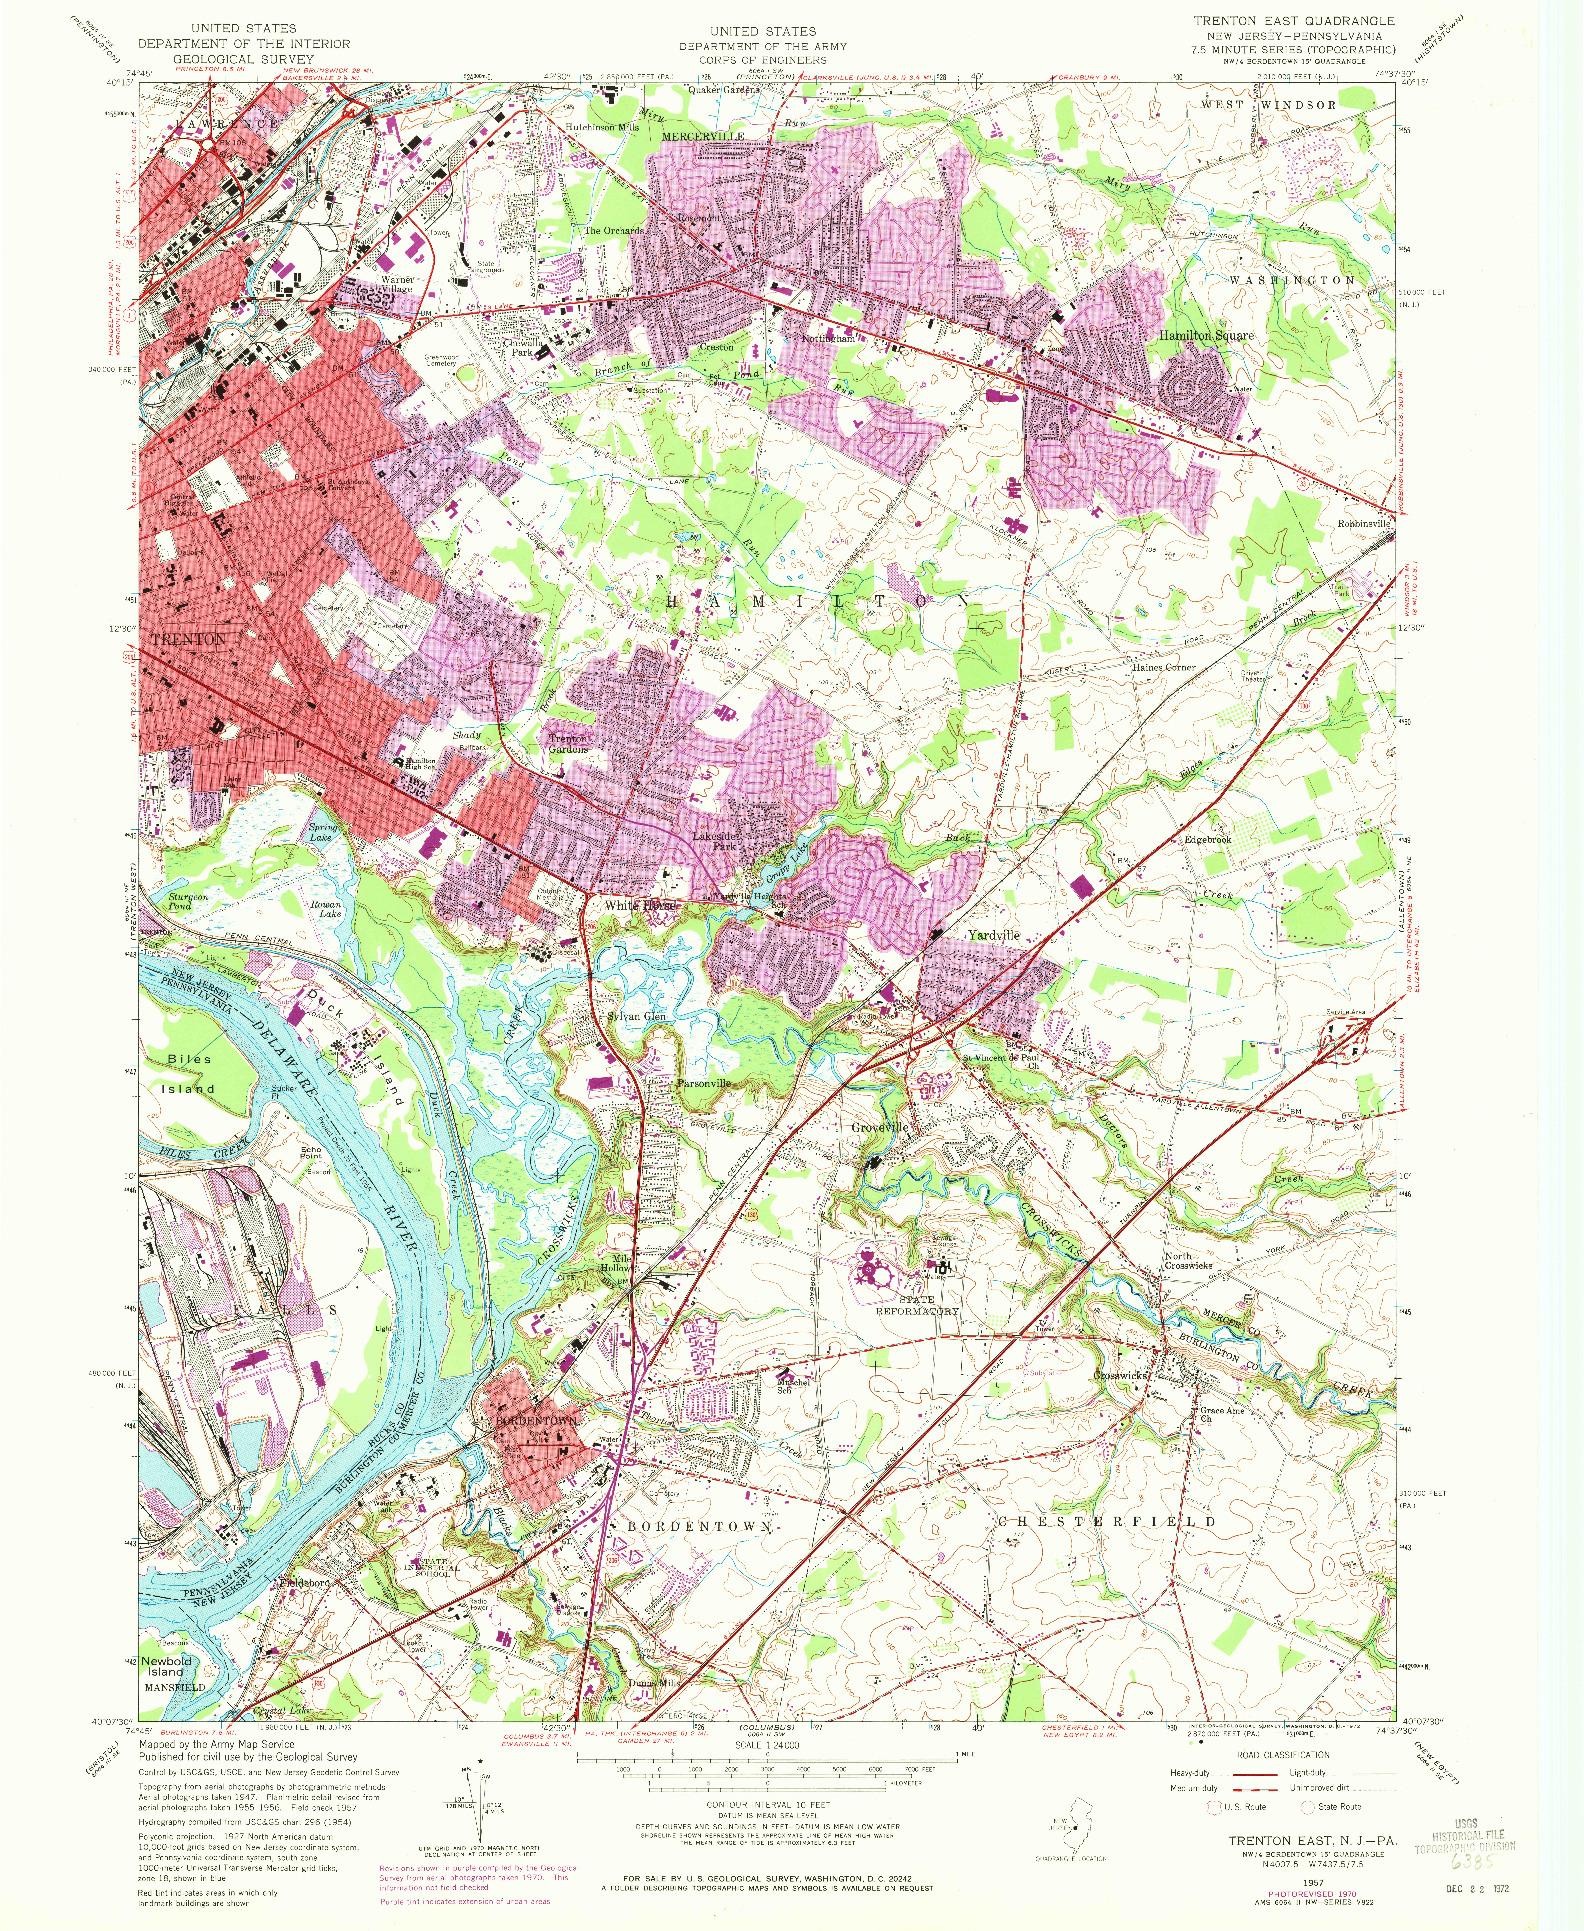 USGS 1:24000-SCALE QUADRANGLE FOR TRENTON EAST, NJ 1957 on map of mullica township nj, map of lawnside nj, map of farmington nj, map of cliffwood beach nj, map of stafford twp nj, map of pedricktown nj, map of west long branch nj, map of wood-ridge nj, map of hightstown nj, map of sea island nj, map of new jersey, map of cape may courthouse nj, map of haddon twp nj, map of normandy beach nj, map of lafayette nj, map of hudson nj, map of ewing township nj, map of leonardo nj, map of alexandria nj, map of mount vernon nj,